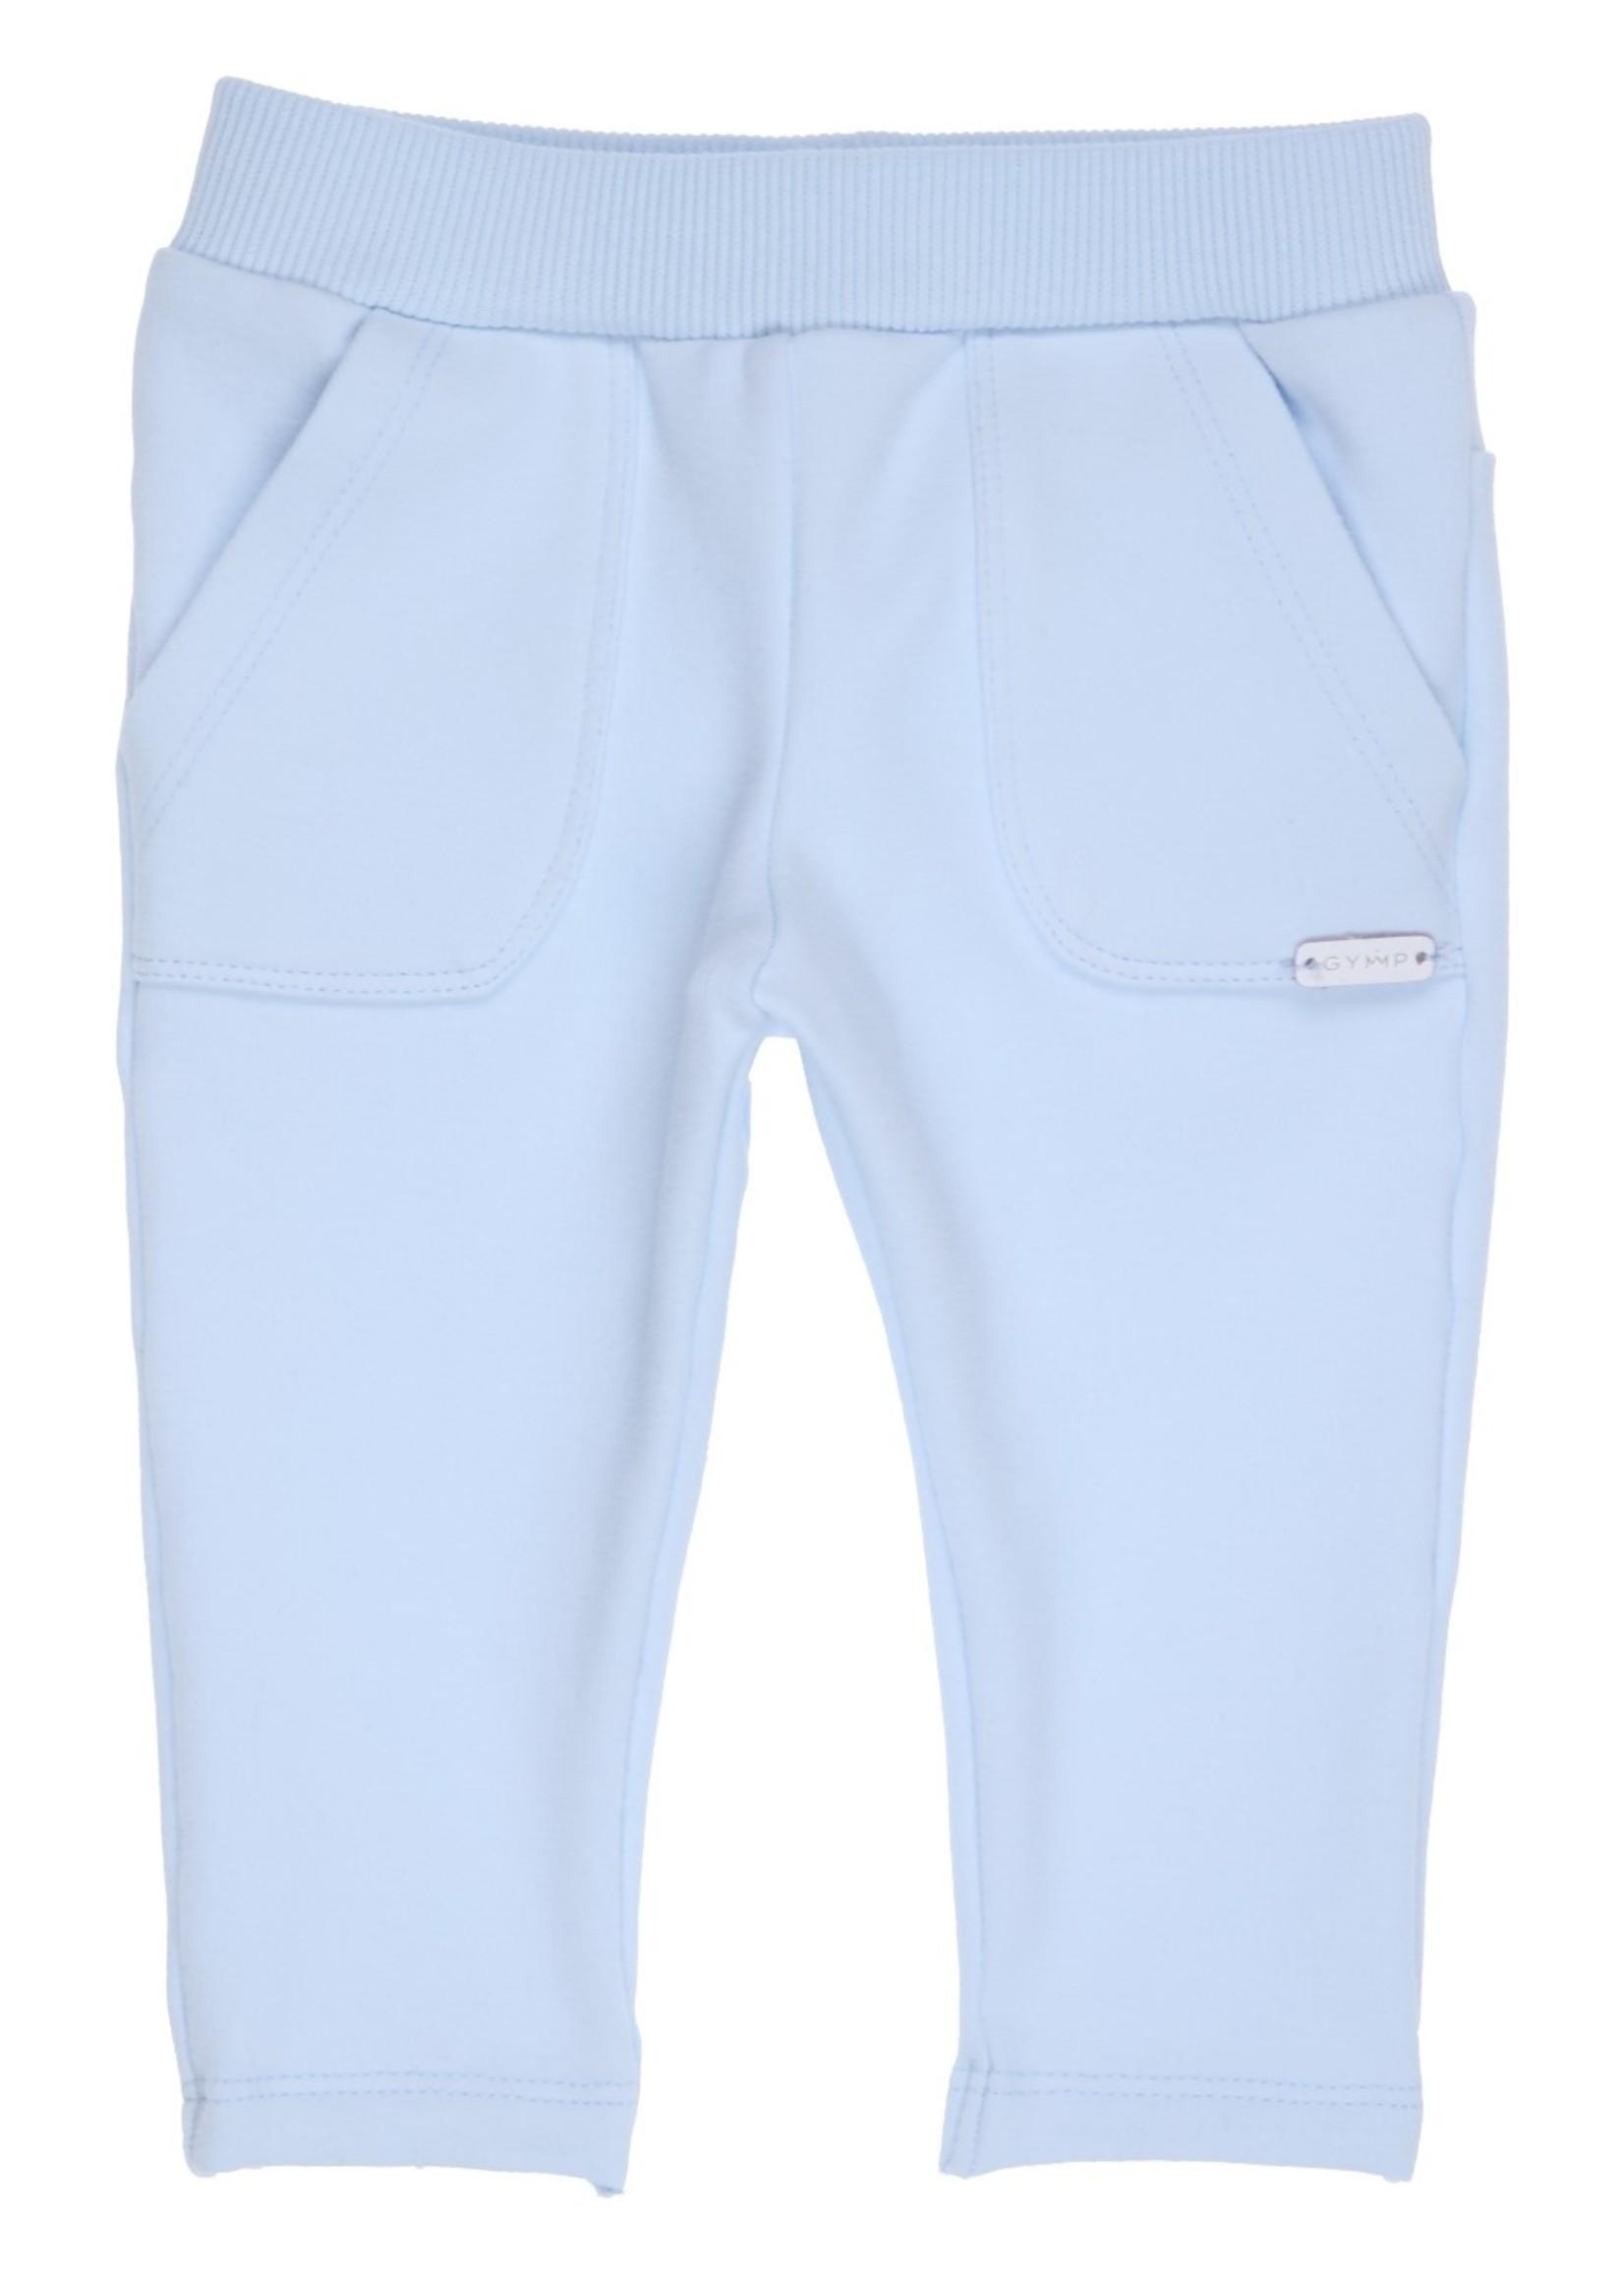 Gymp Gymp pants lichtblauw